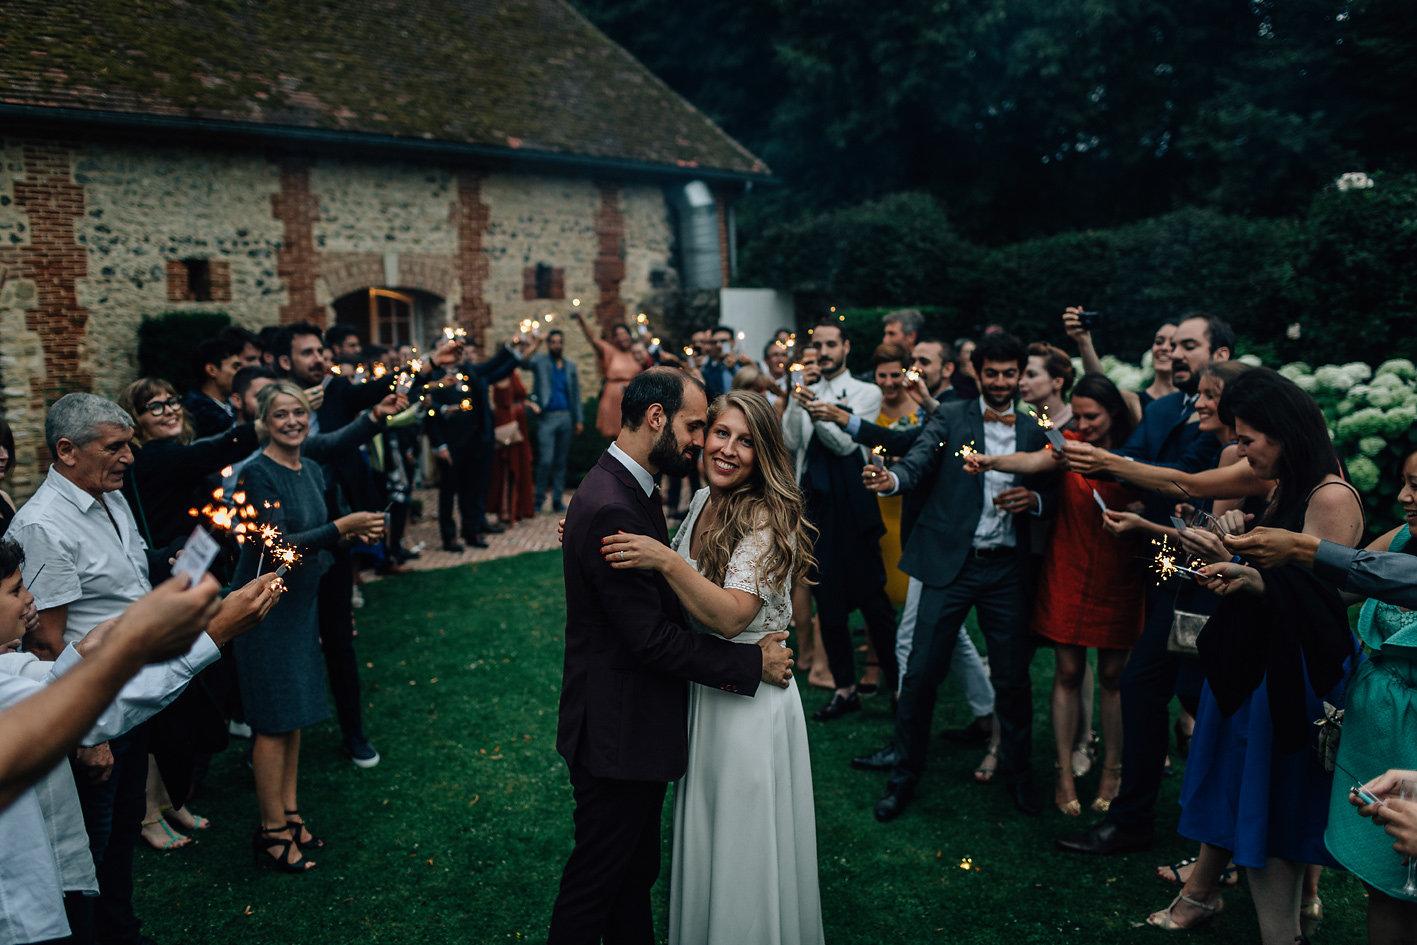 pierreatelier-photographe-mariage-paris-orangeriedevatimesnil-674.jpg